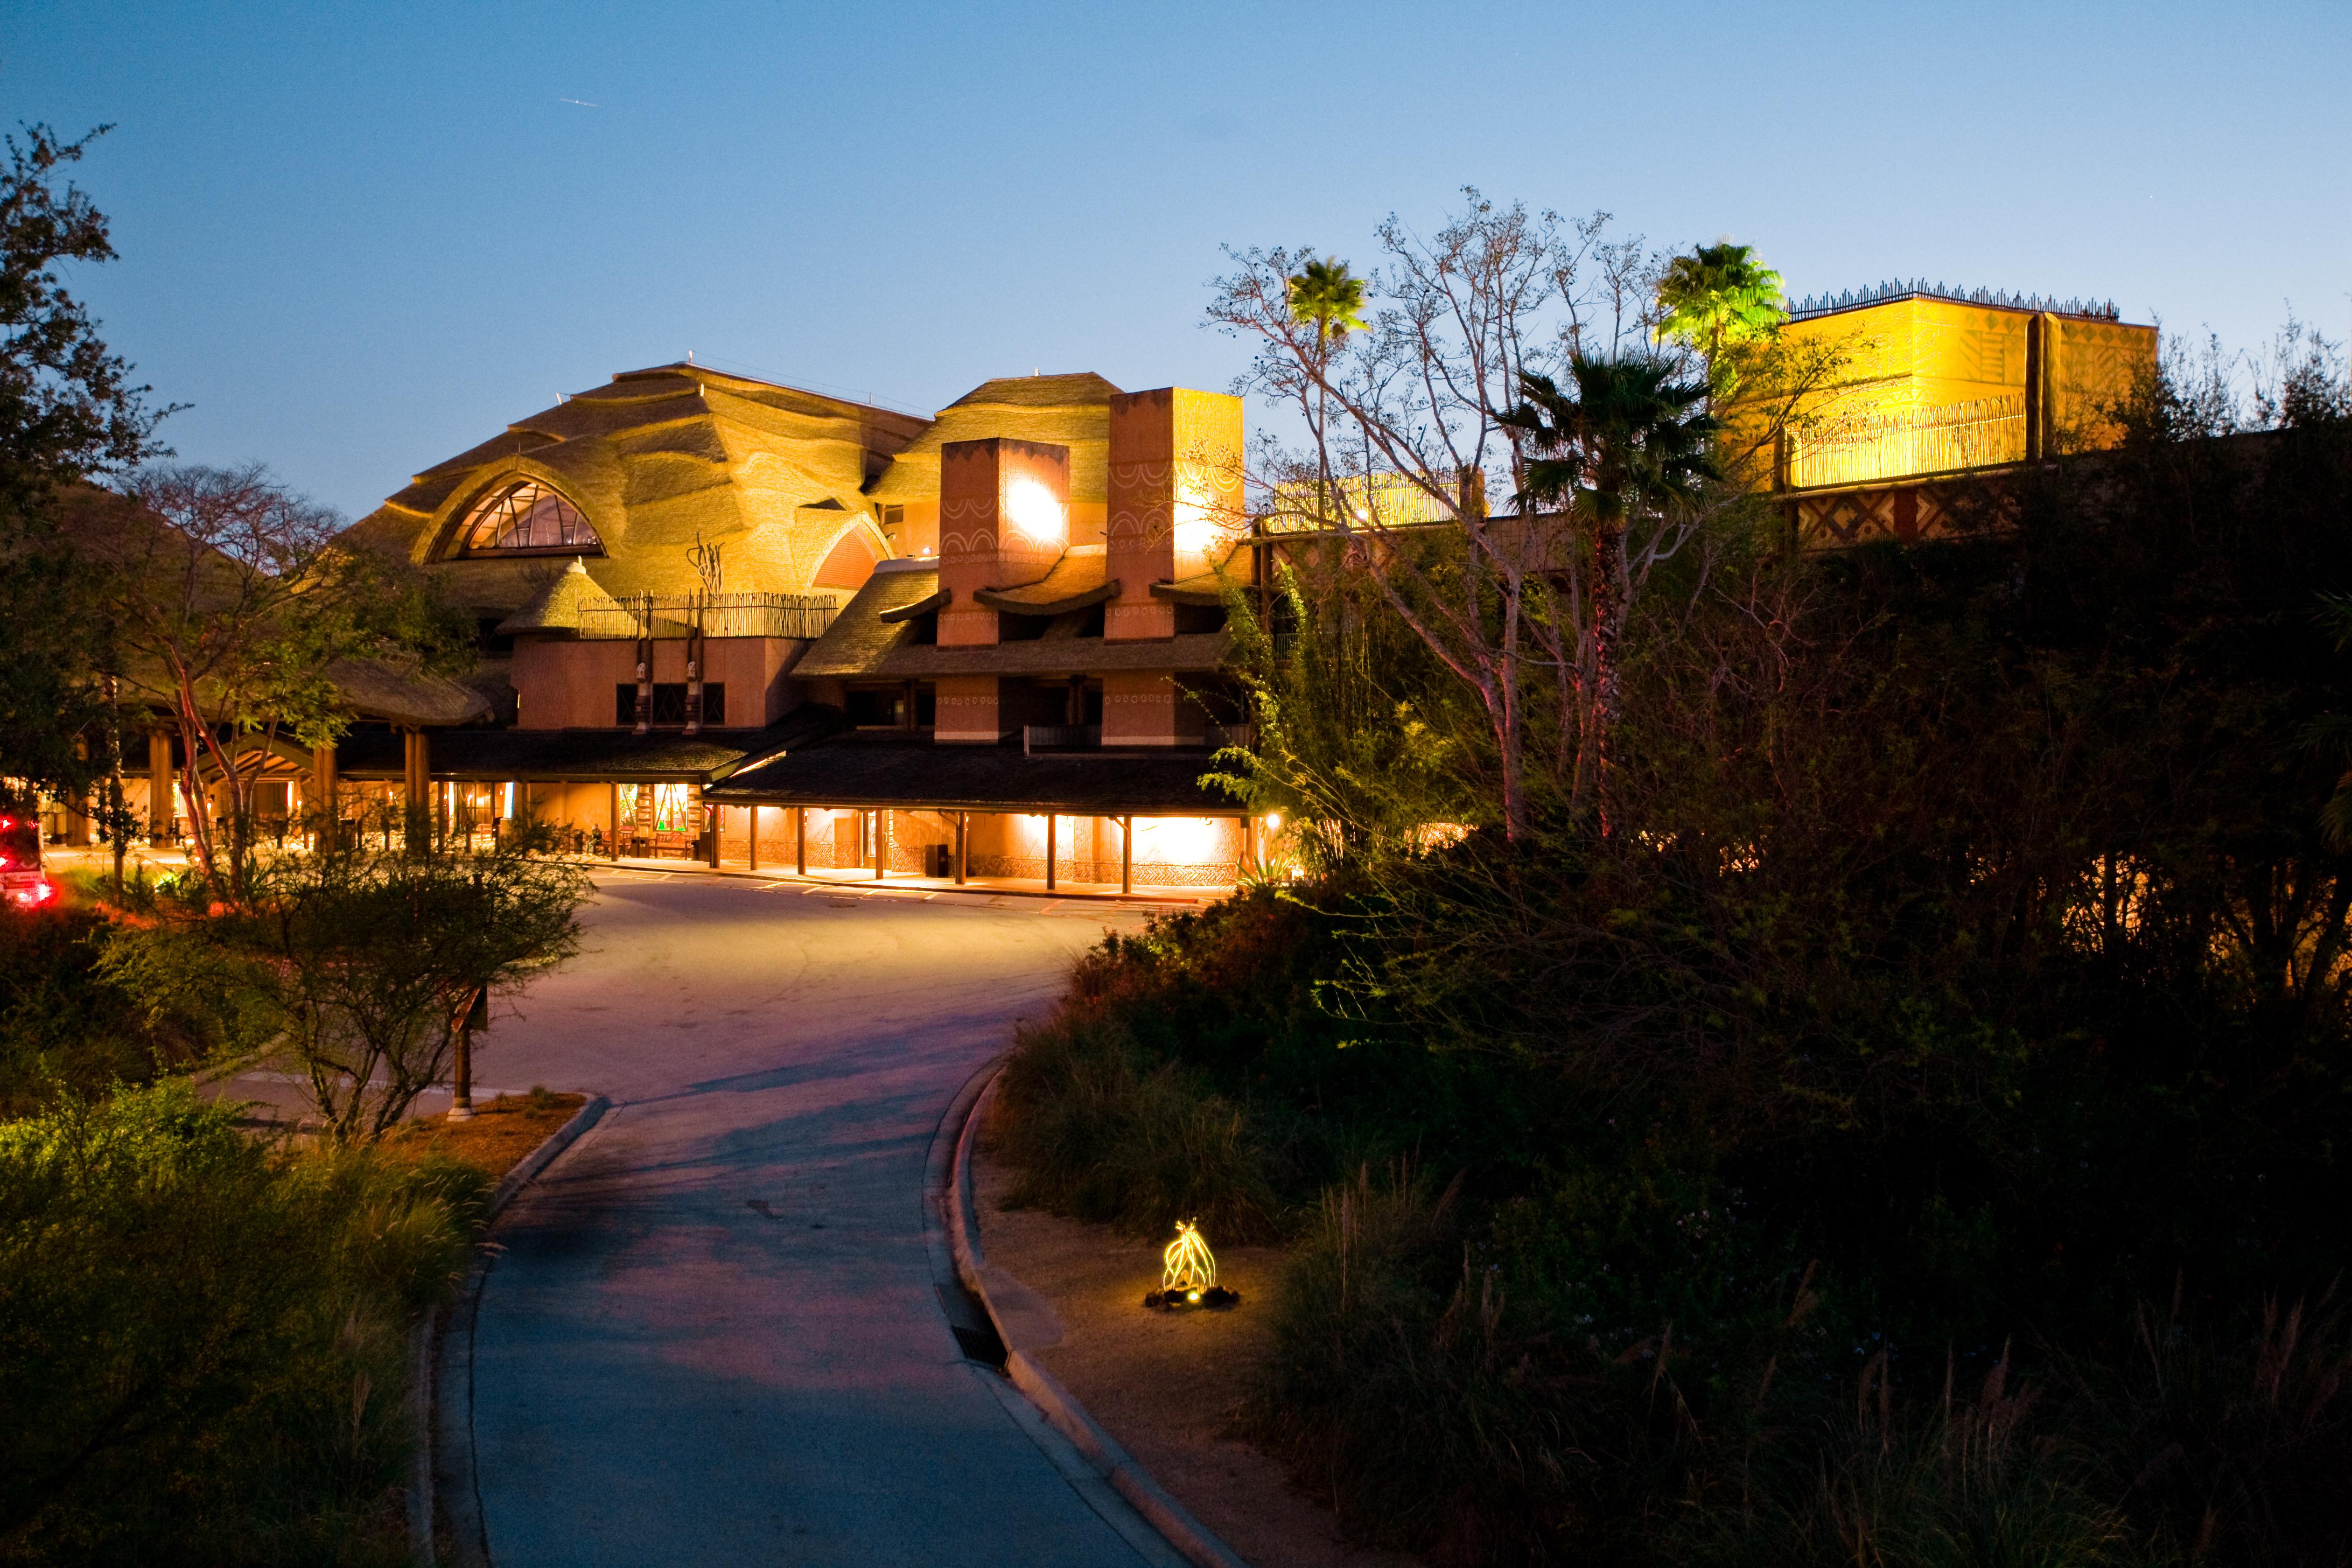 disney's animal kingdom lodge and villas